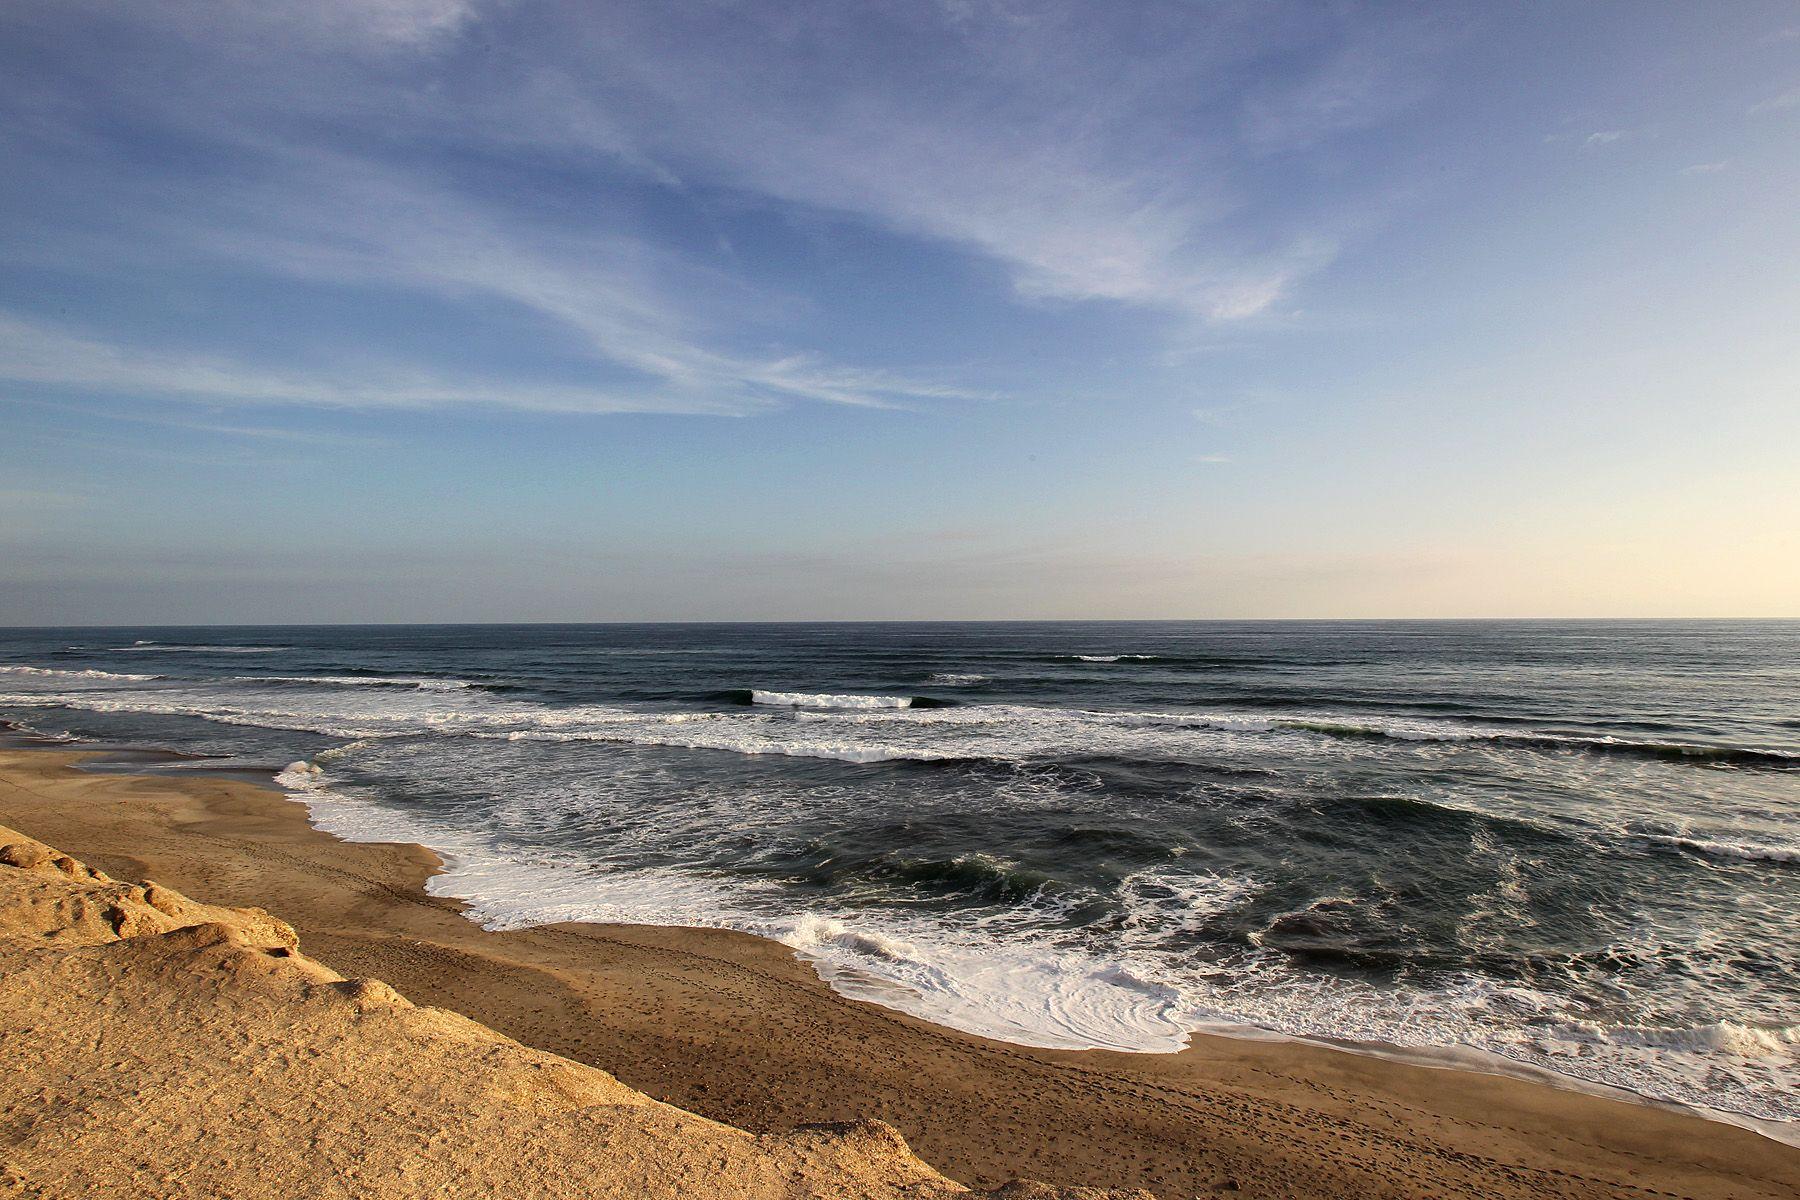 Playa Bolivia ubicado en Ilo - Moquegua. Foto: ANDINA/Rubén Grández